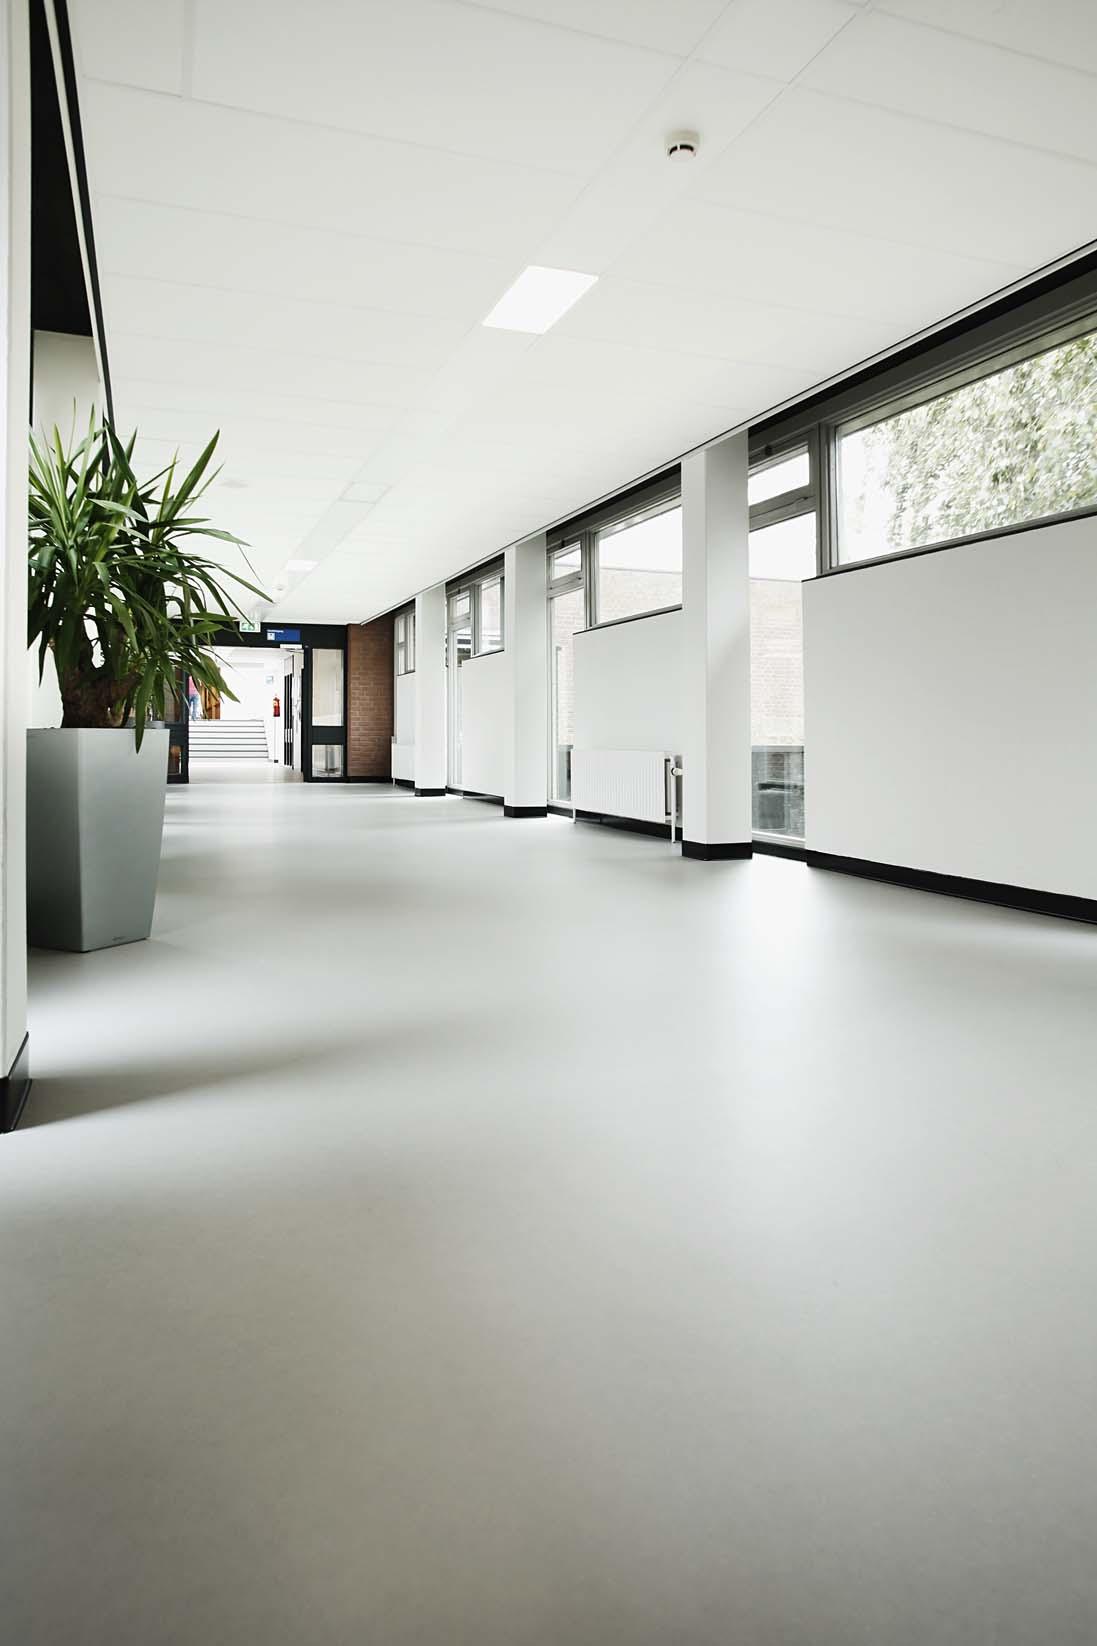 wineo Purline Bioboden Rollenware weiß modern hell Korridor große Glasfenster Klinikum